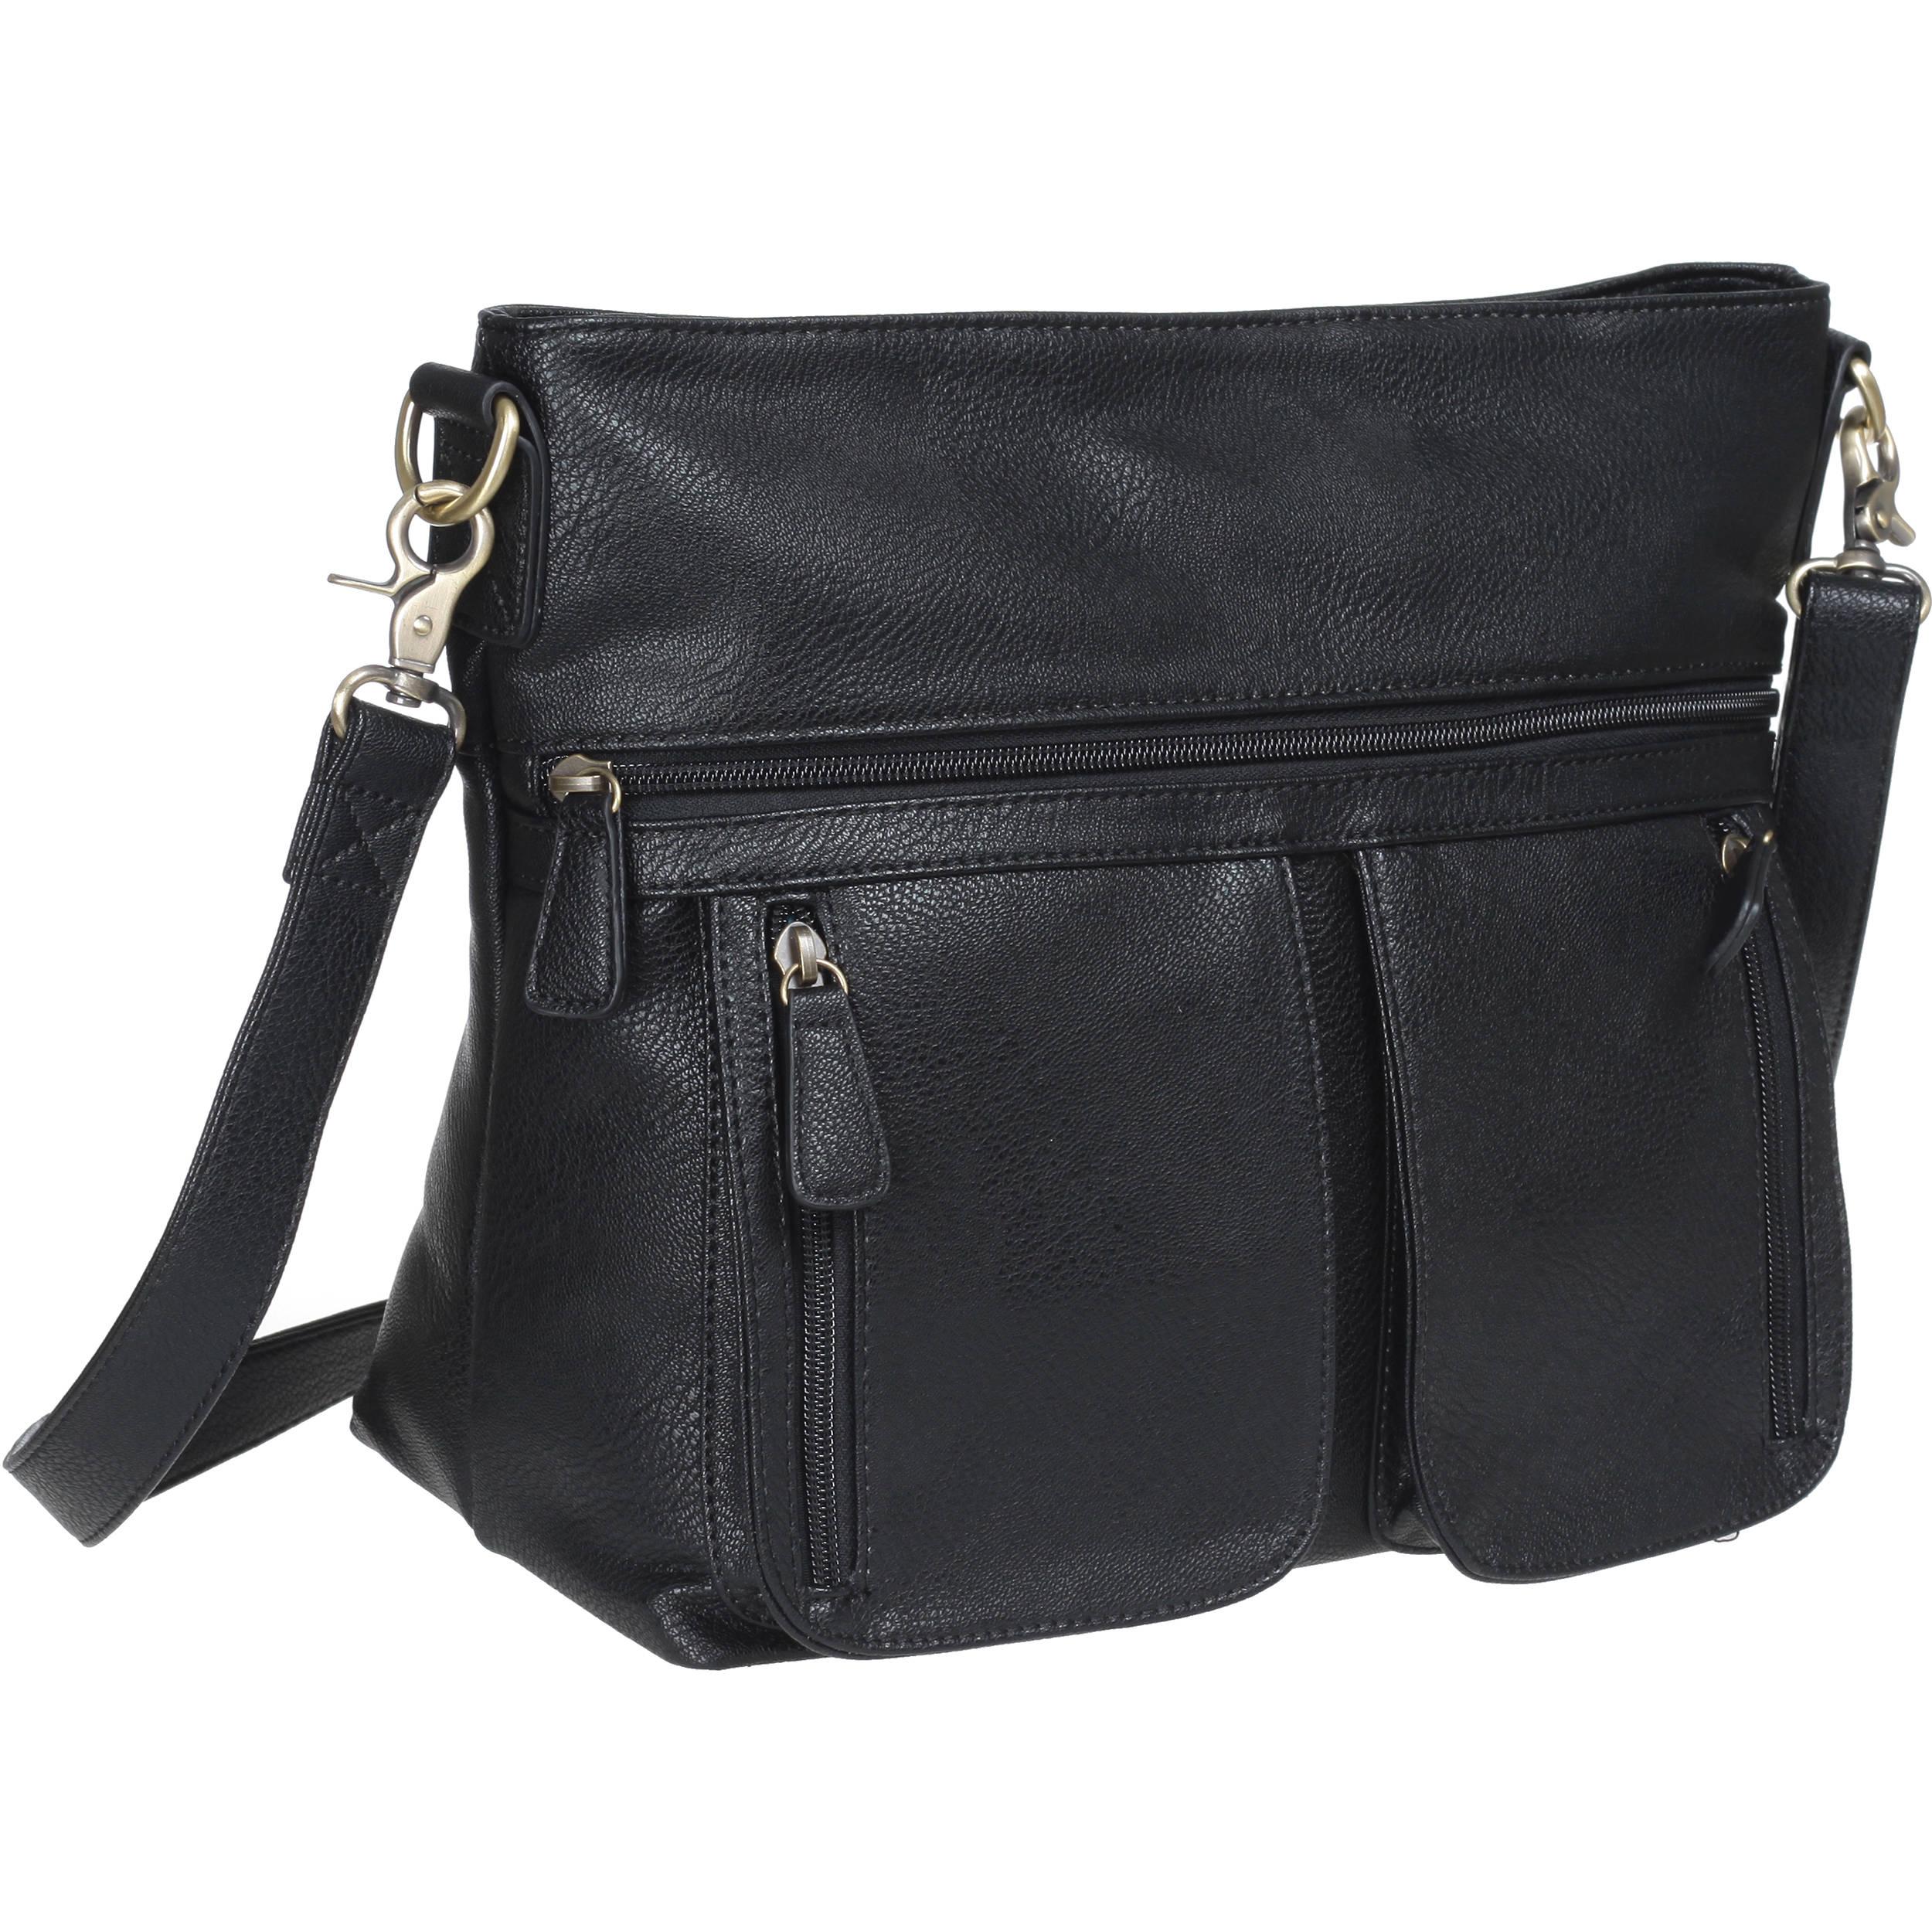 Camera Bags for Women | Fashion Camera Bags - B&H Photo